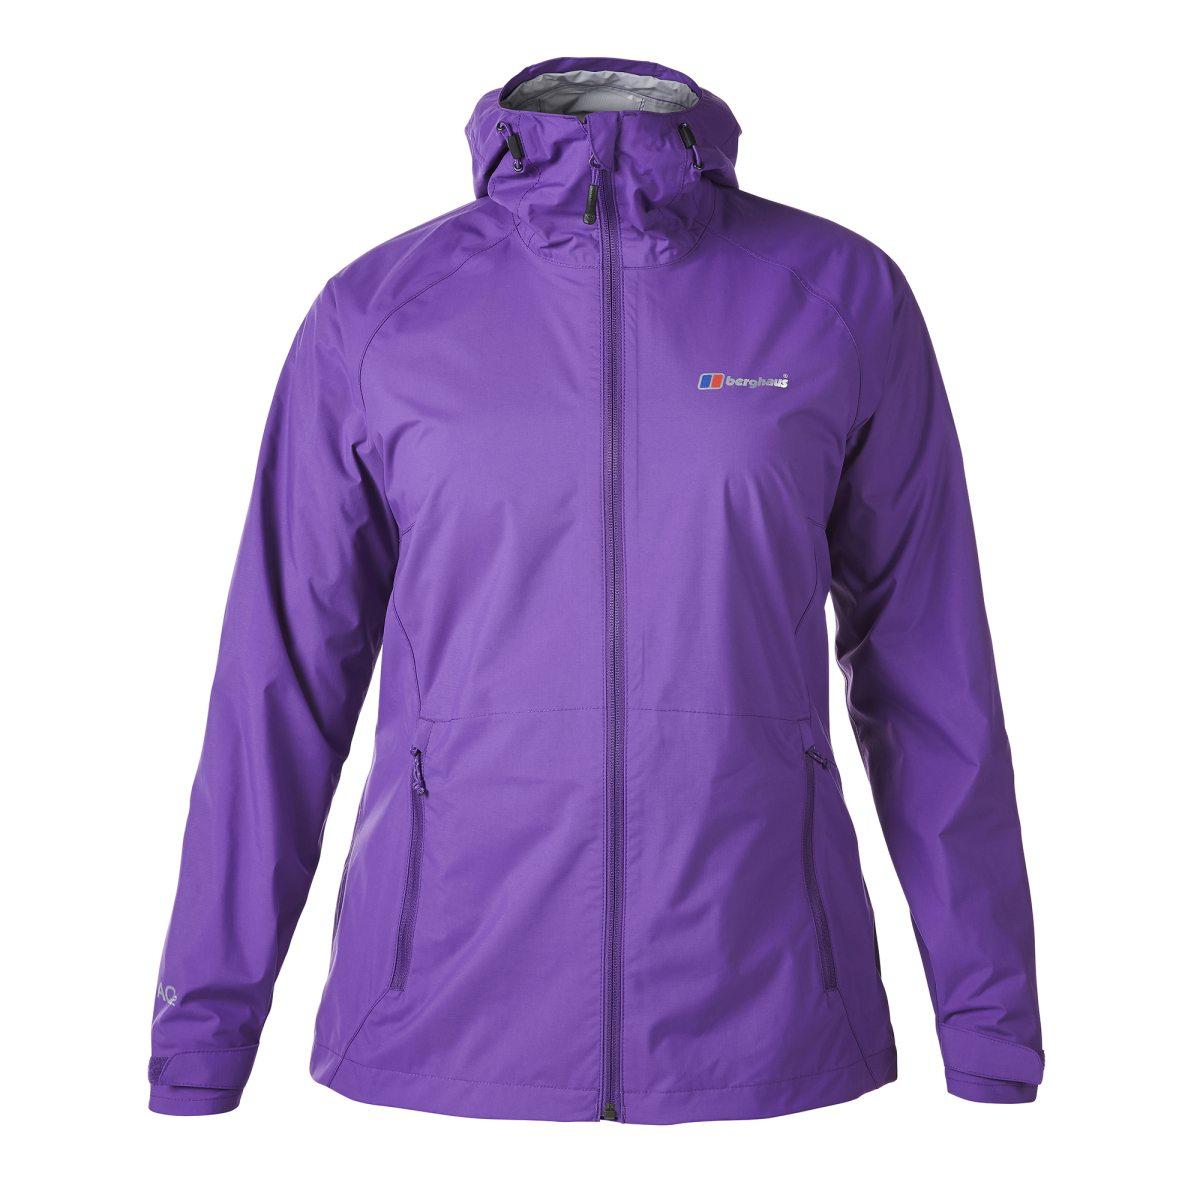 340a5e45 Buy fiolett bergans tyin ins jacket skijakke dame ski og snowboardjakker  no. Shop every store on the internet via PricePi.com with purple